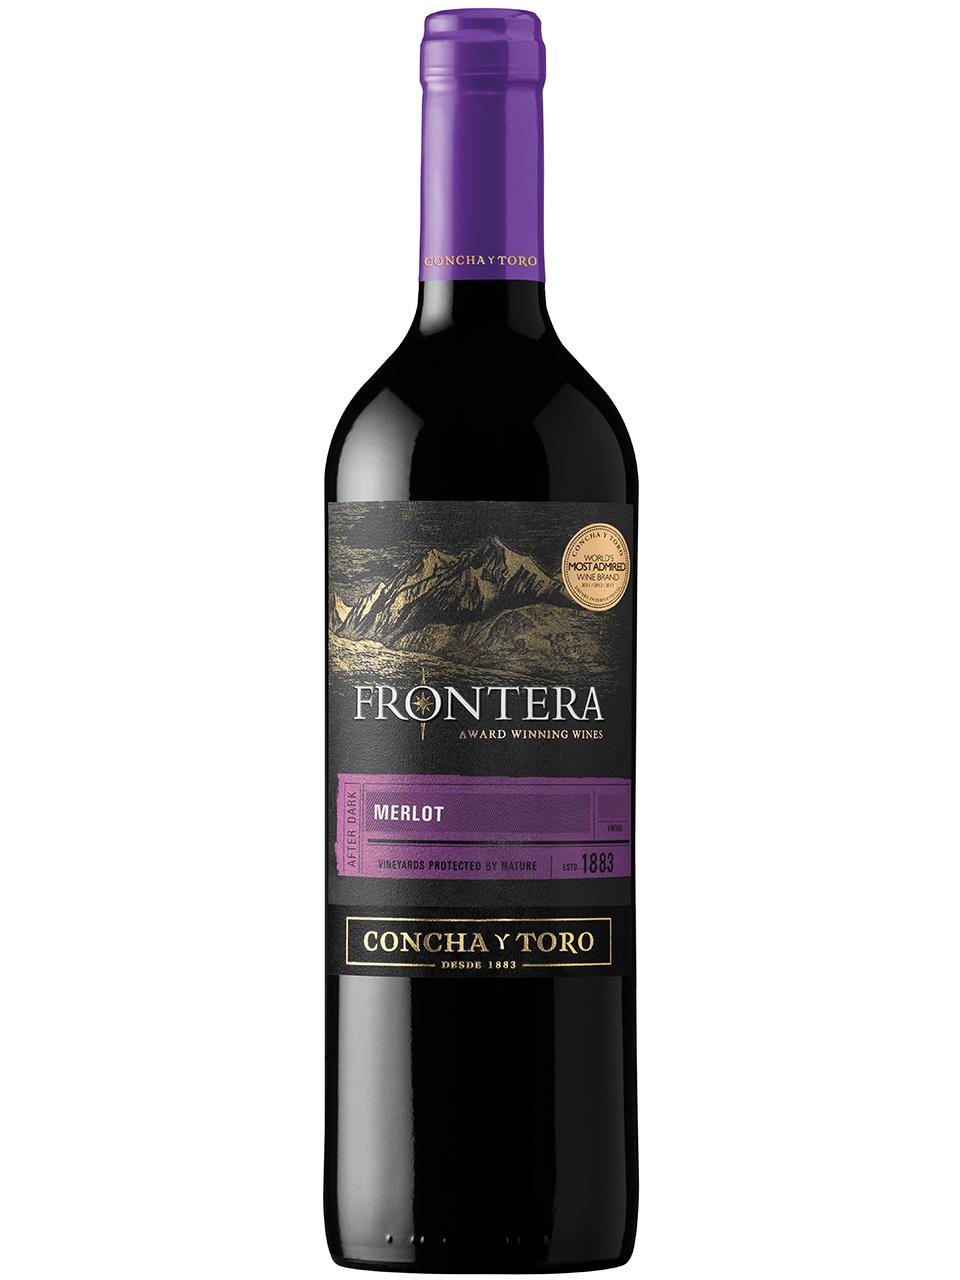 Concha Y Toro Frontera Merlot